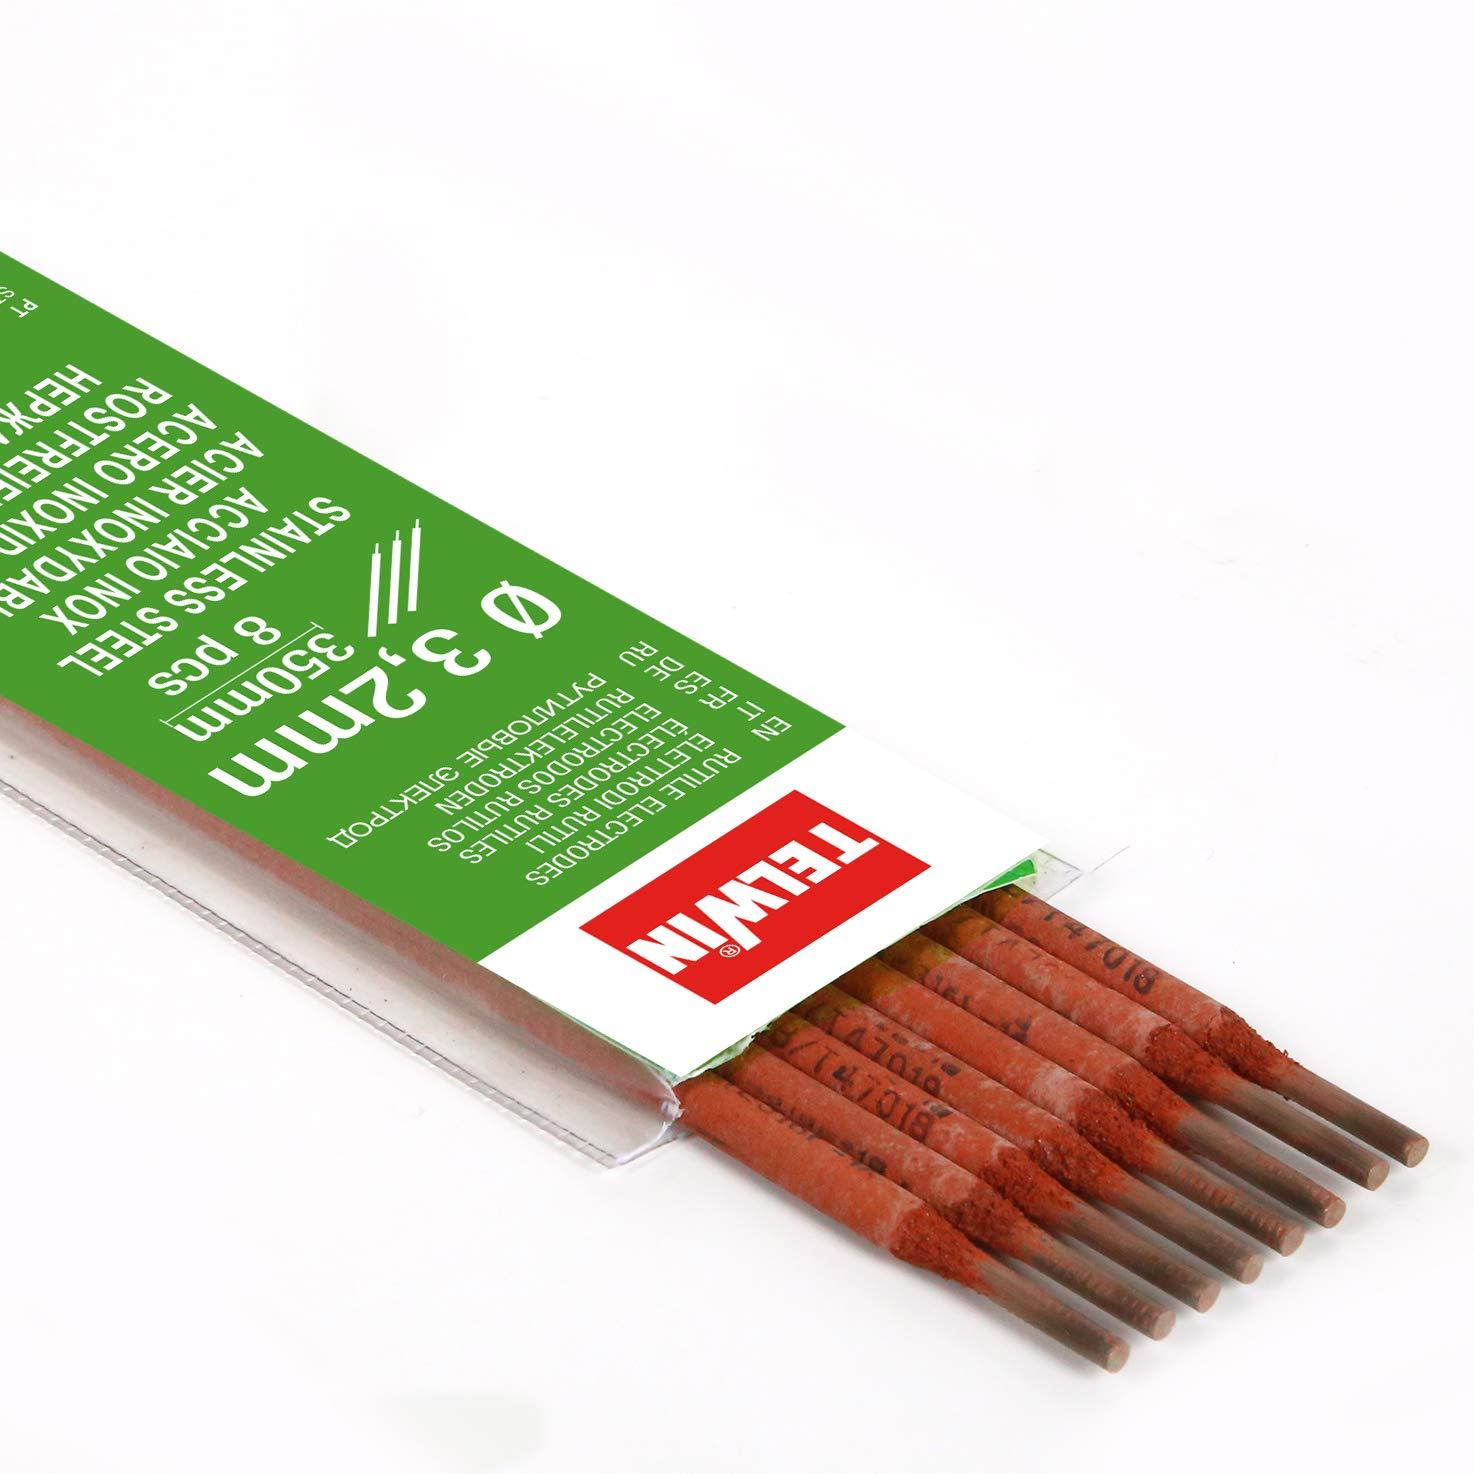 Telwin - Electrodos rutilos acero inox. kit 8 piezas Ø 3,2 ...